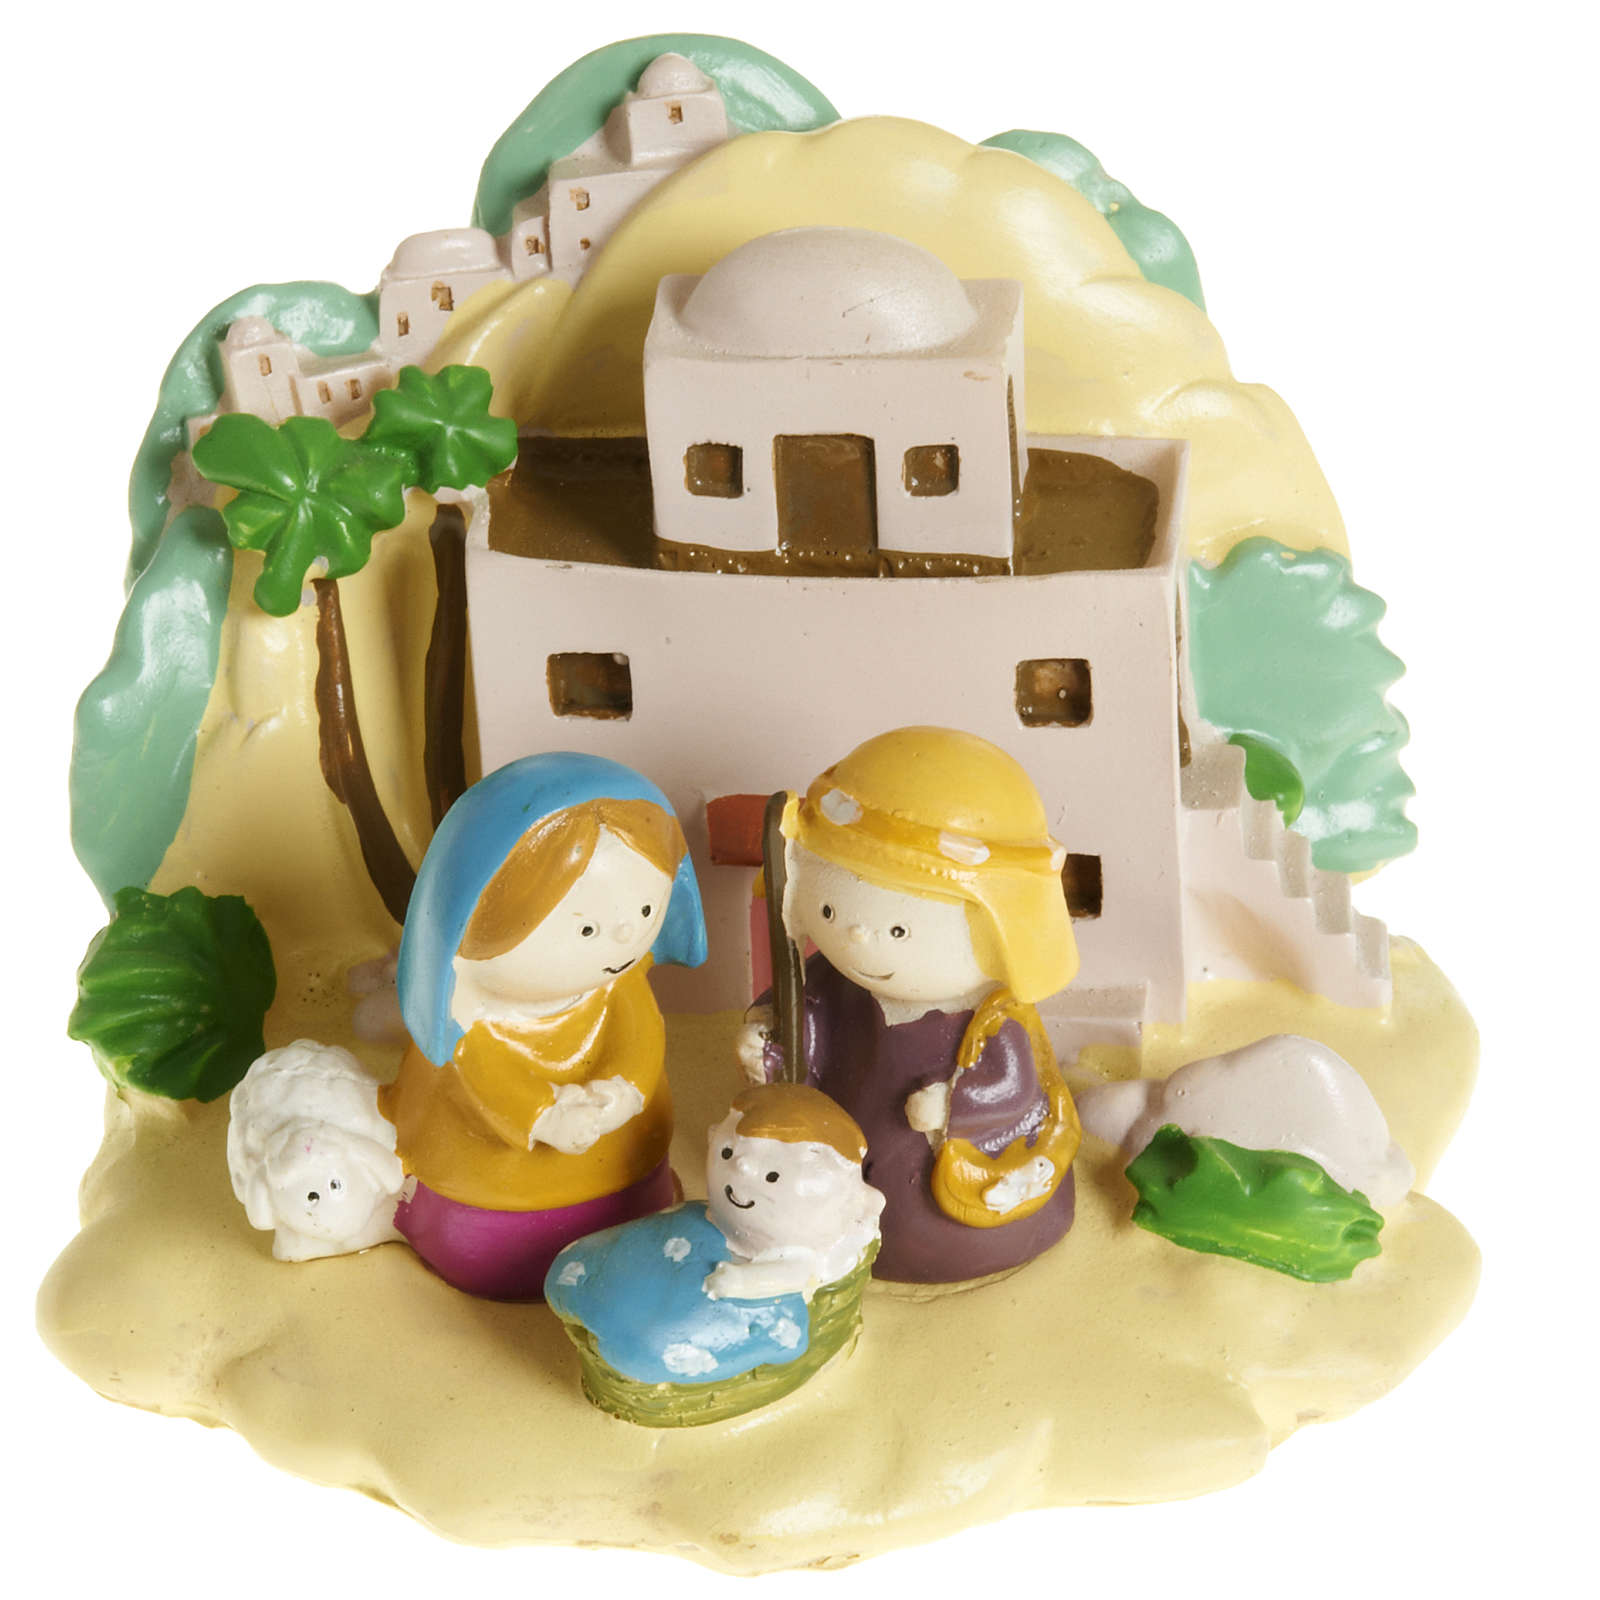 Natividad con paisaje resina colorada 8 x 12 3